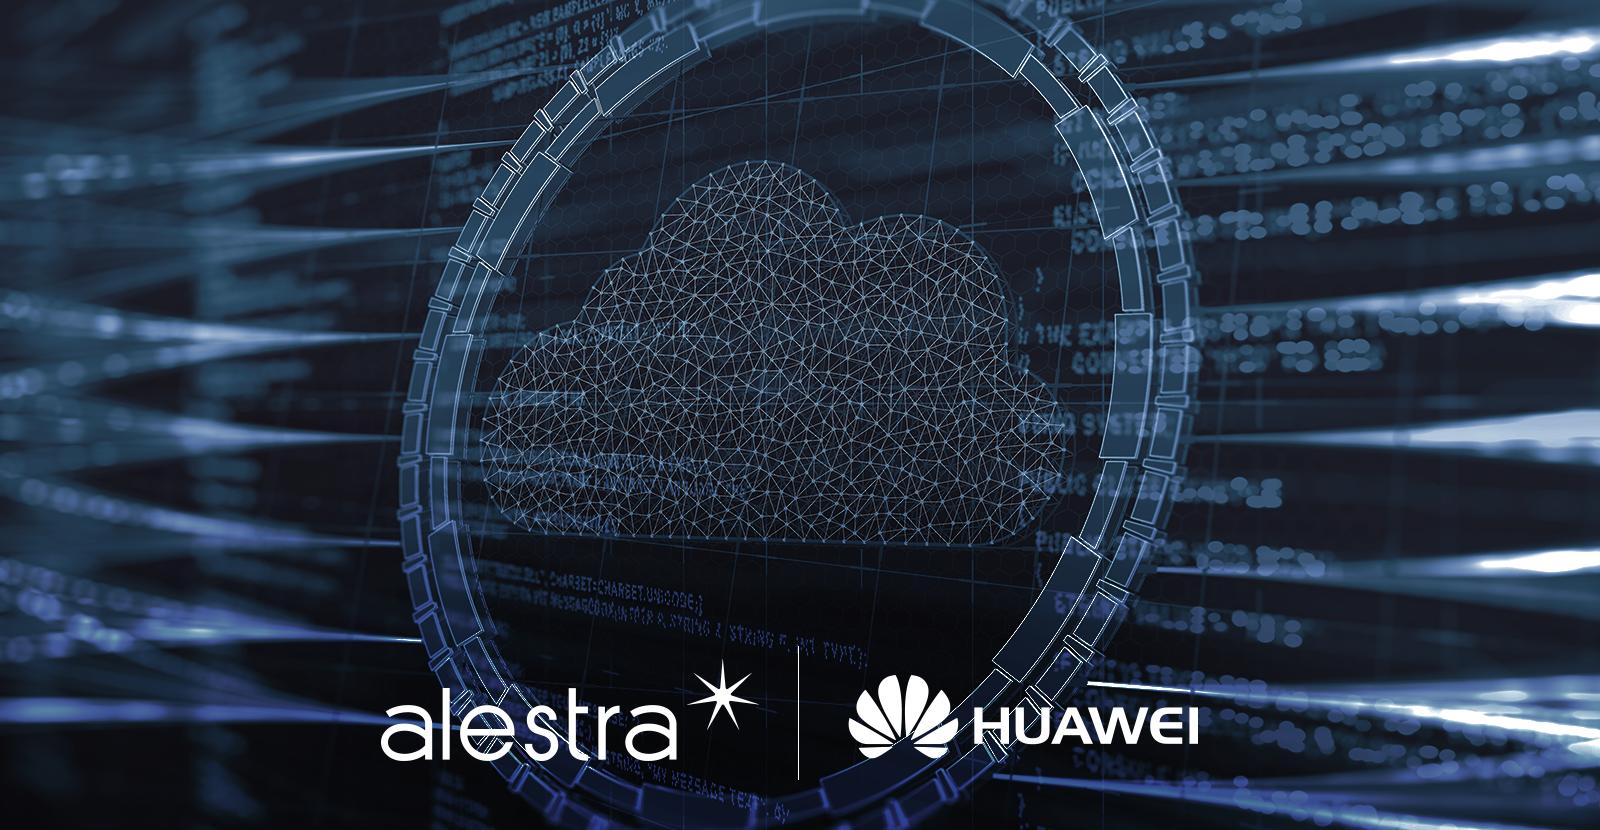 Alestra-Huawei-nube-virtualizacion